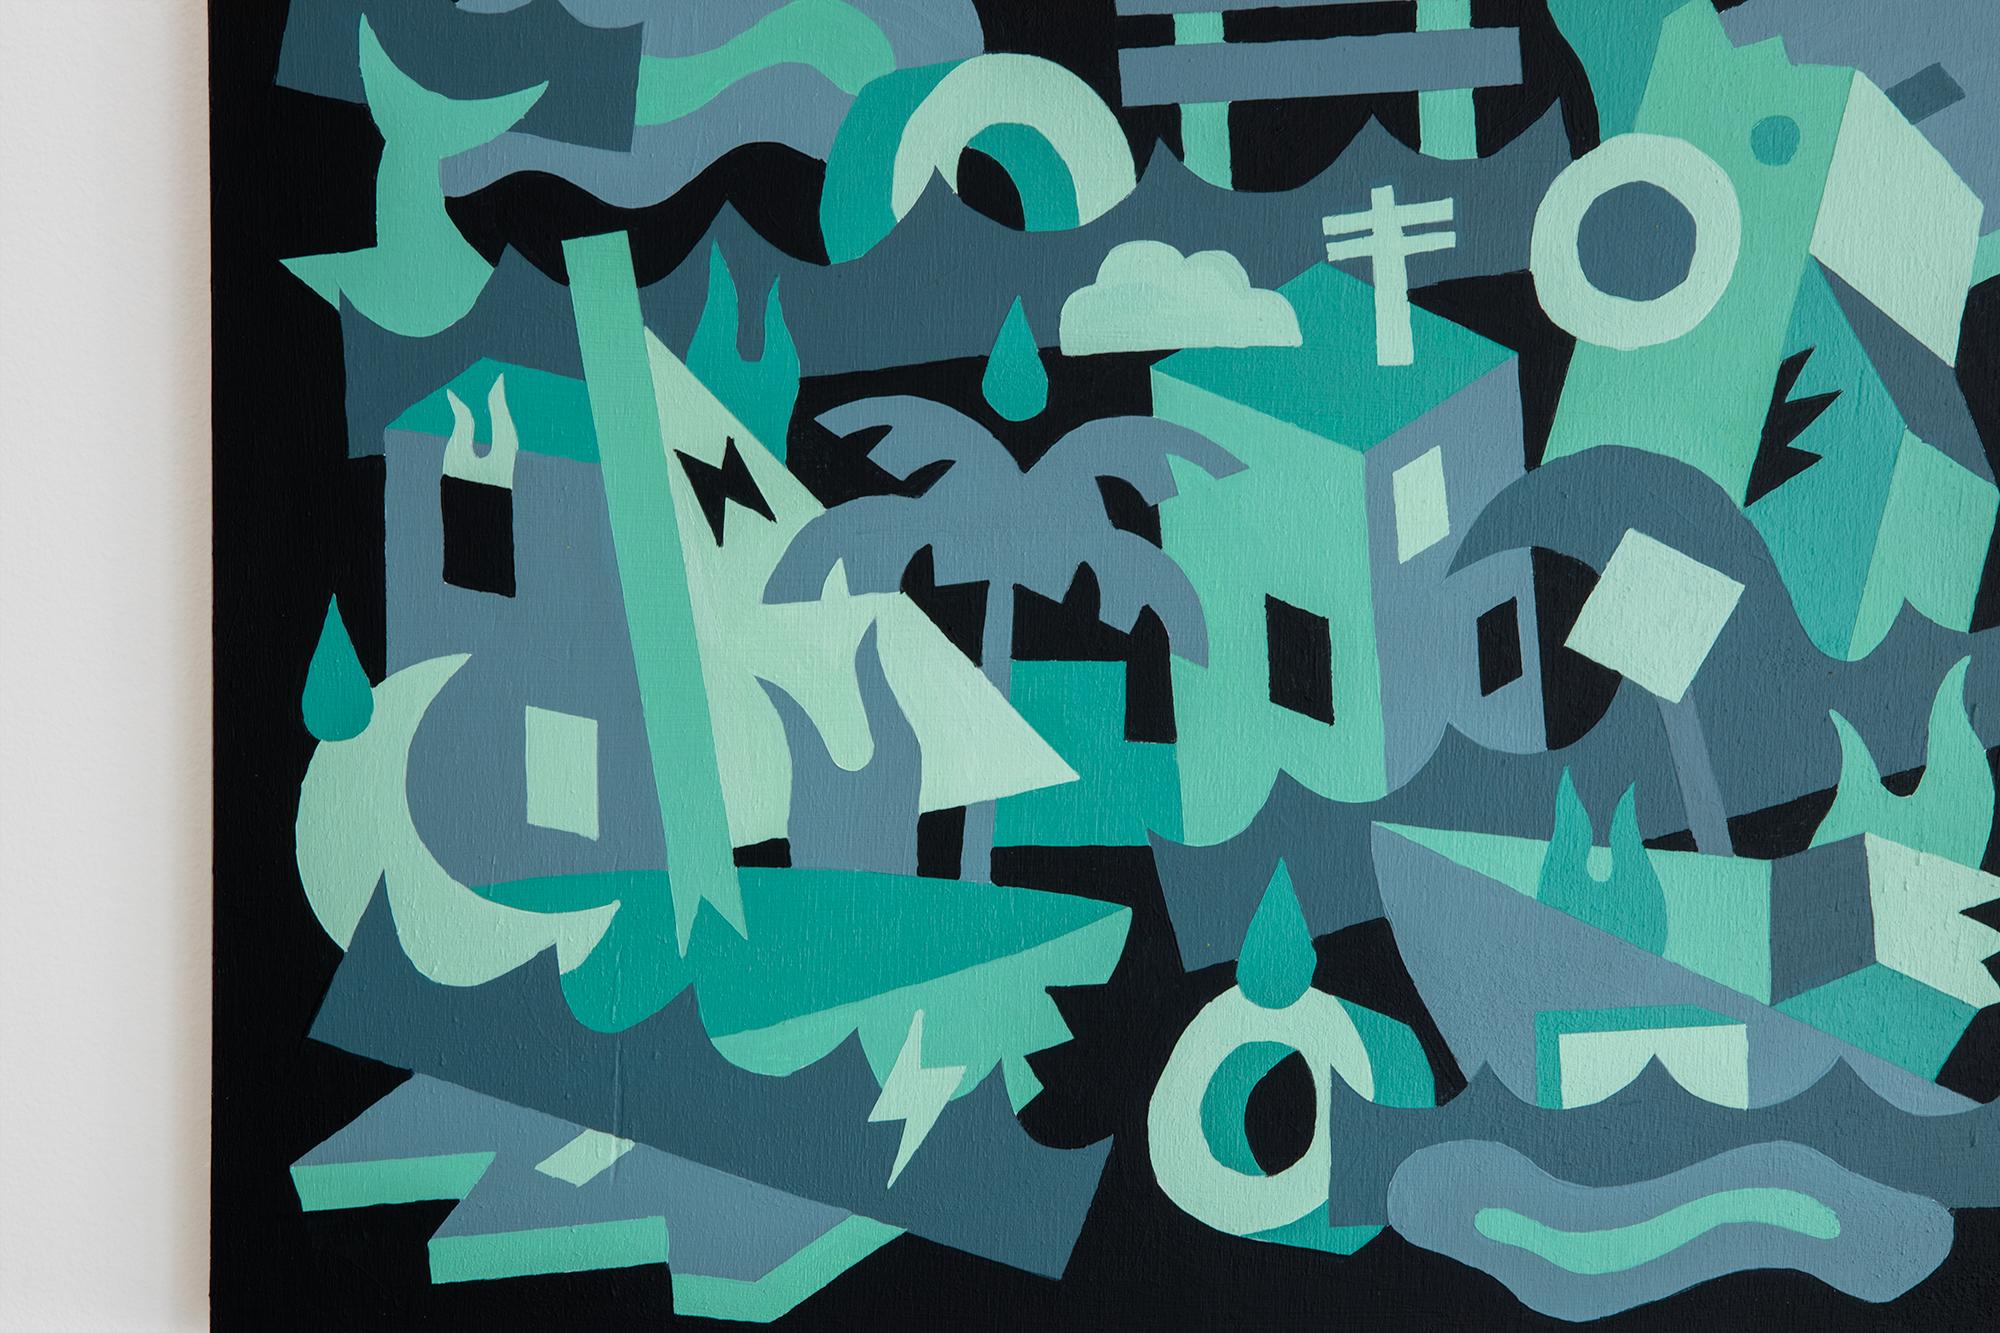 noah-levy-painting-acrylic-biscayne-bay-miami-2.jpg